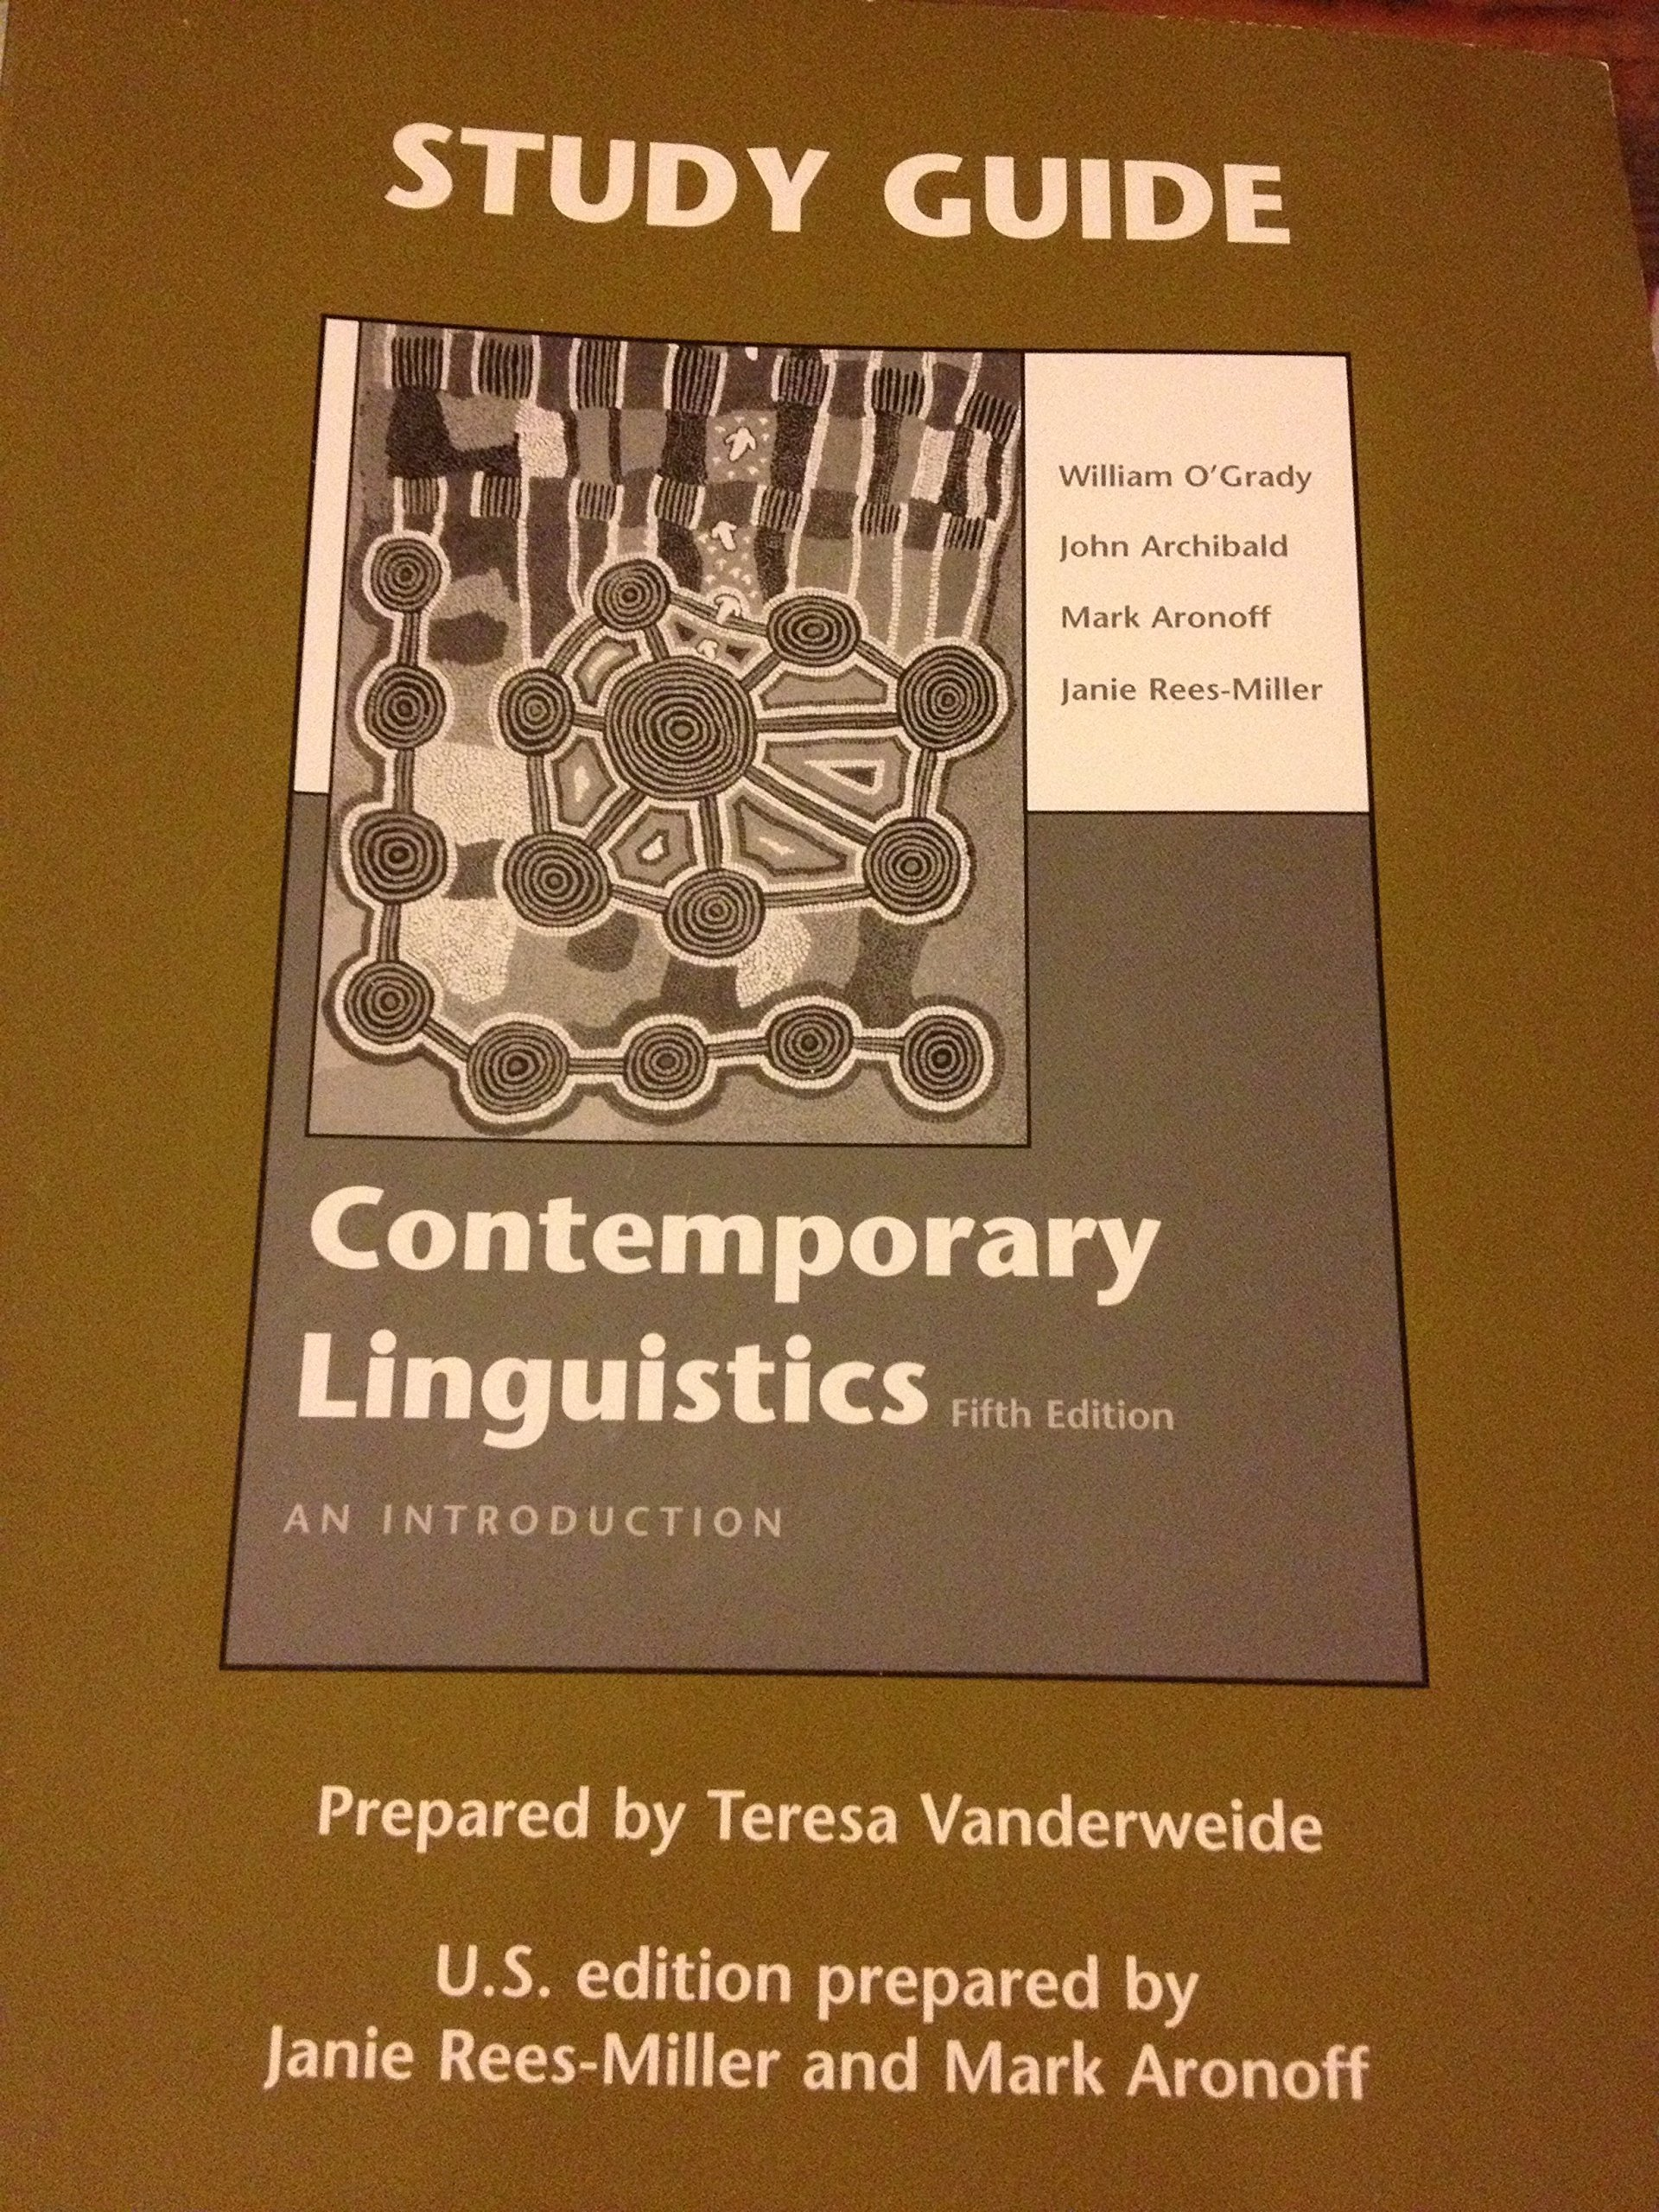 Contemporary Linguistics 5TH EDITION: William O'Grady, John Archibald, Mark  Aronoff, Janie Rees-Miller: Amazon.com: Books